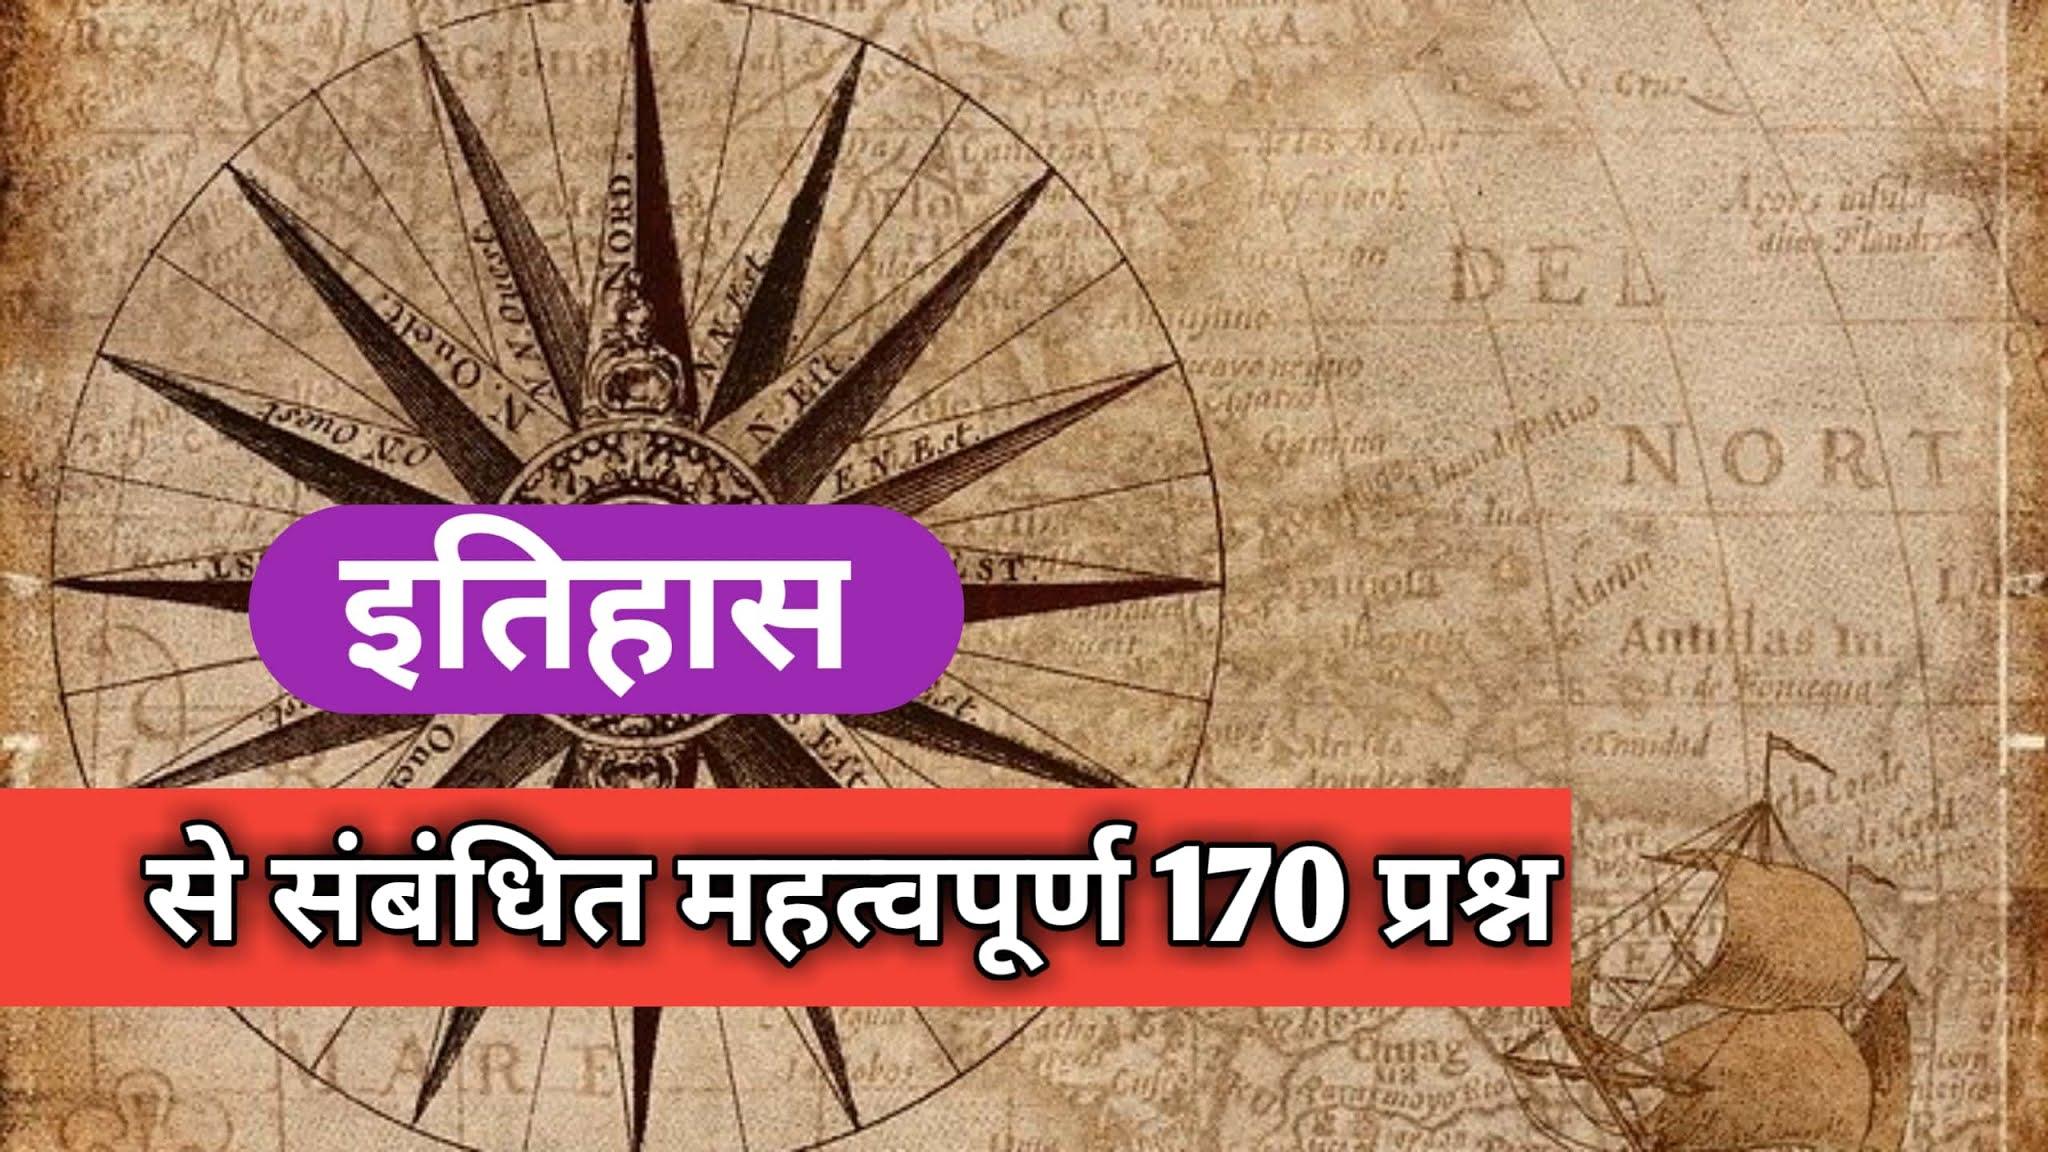 इतिहास से संबंधित महत्वपूर्ण 170 प्रश्न। Itihas Se Sambandhit Mahtvpurn 170 Prshn